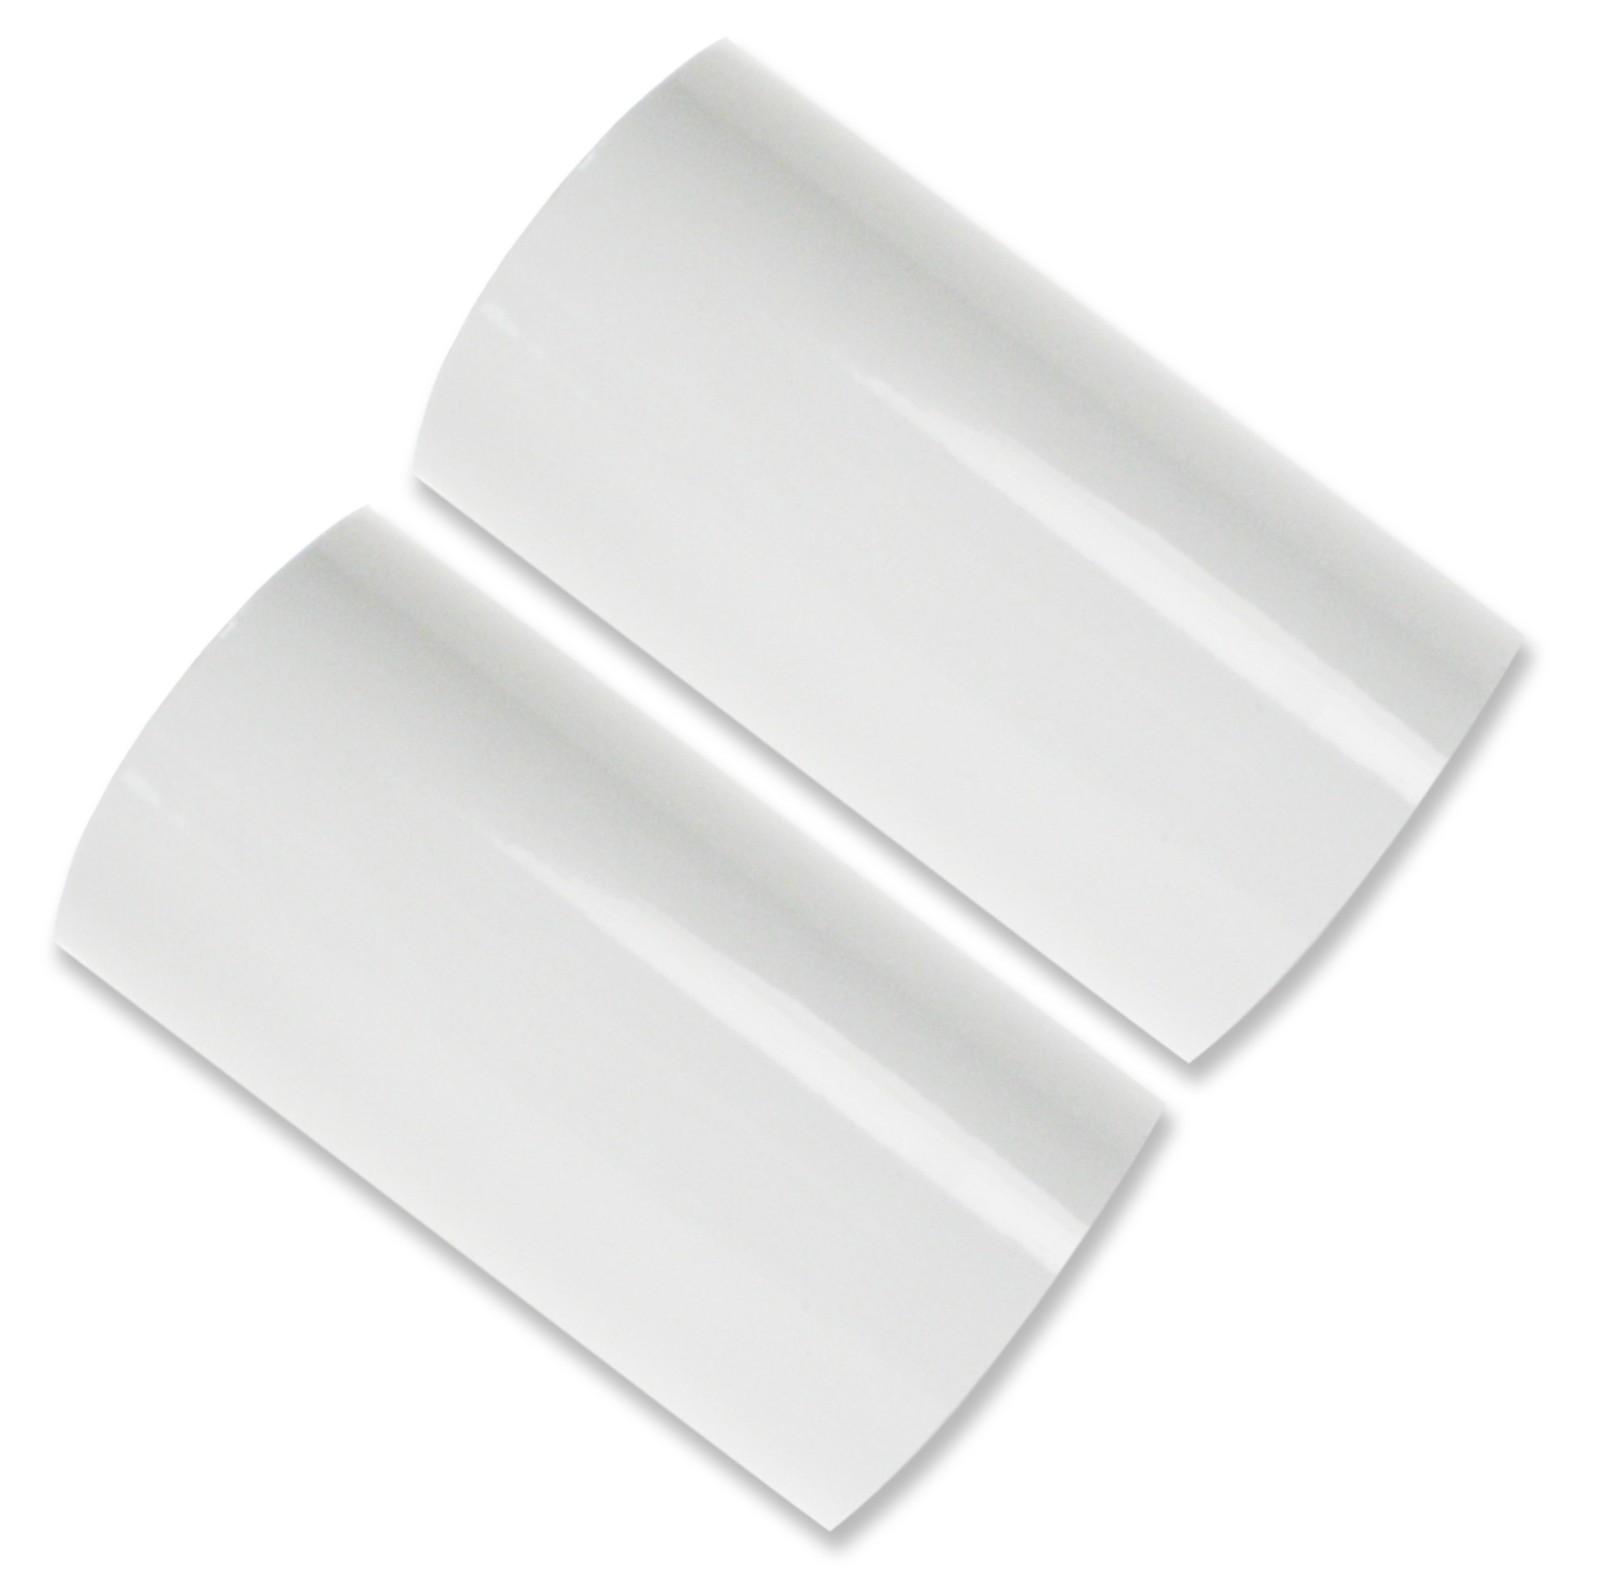 Hot Foil Stamp Rolls White